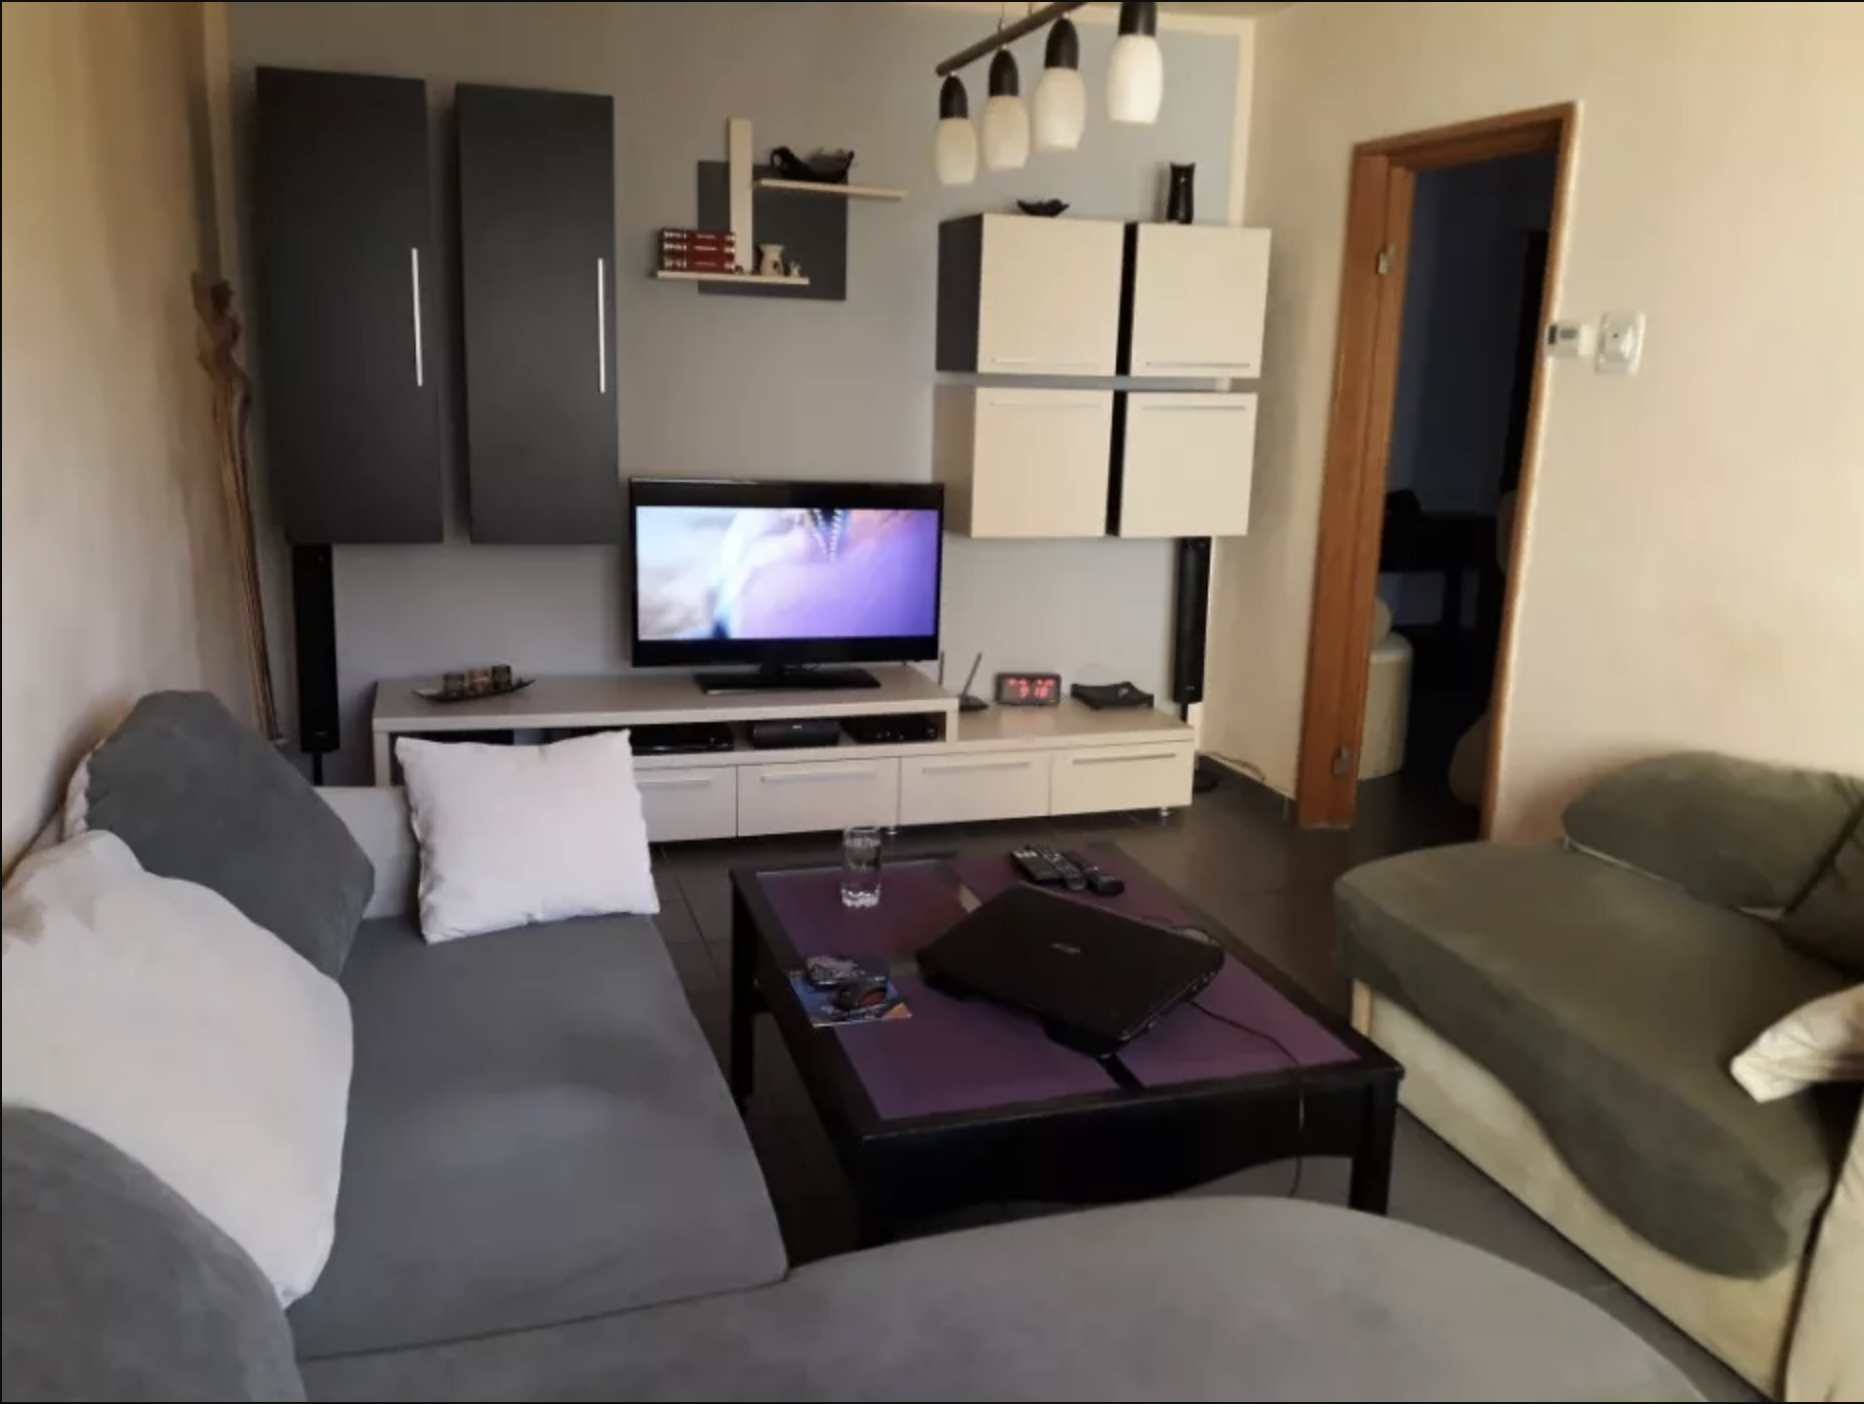 Et.2 Valea Aurie/ Liziera padure – Apartament 4 camere 2 bai